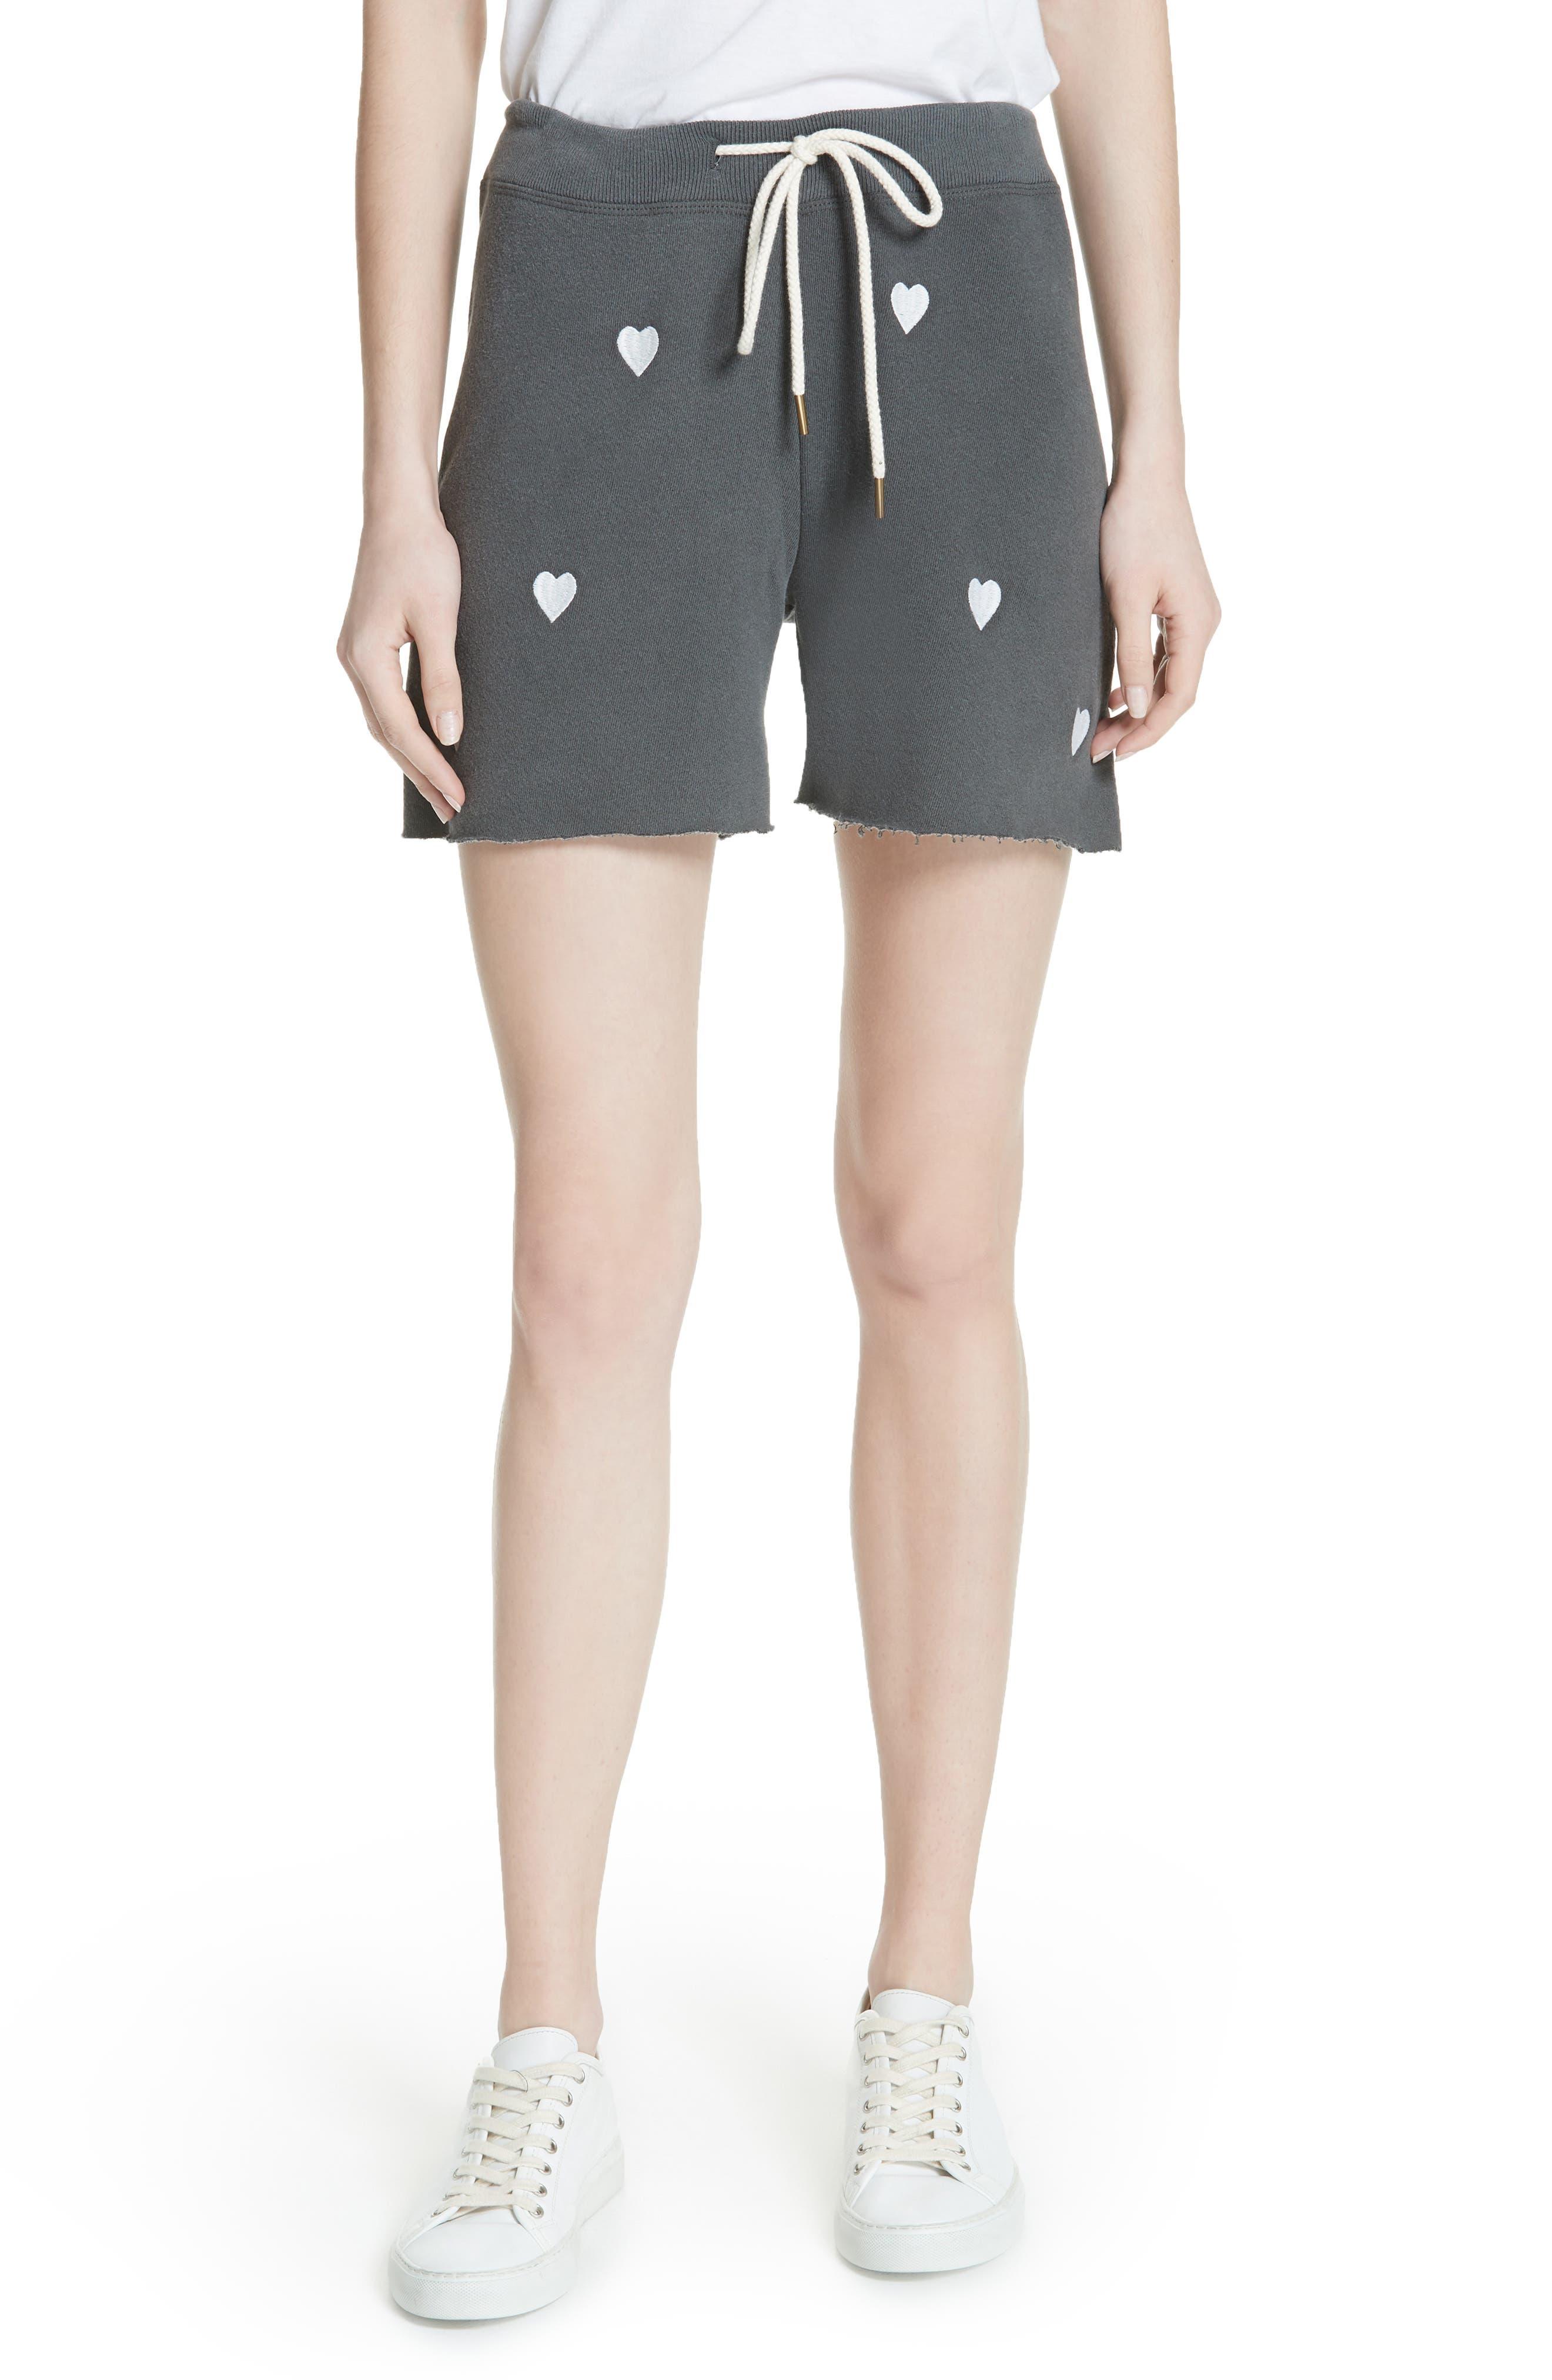 The Sweat Shorts,                             Main thumbnail 1, color,                             Washed Black/ White Hearts